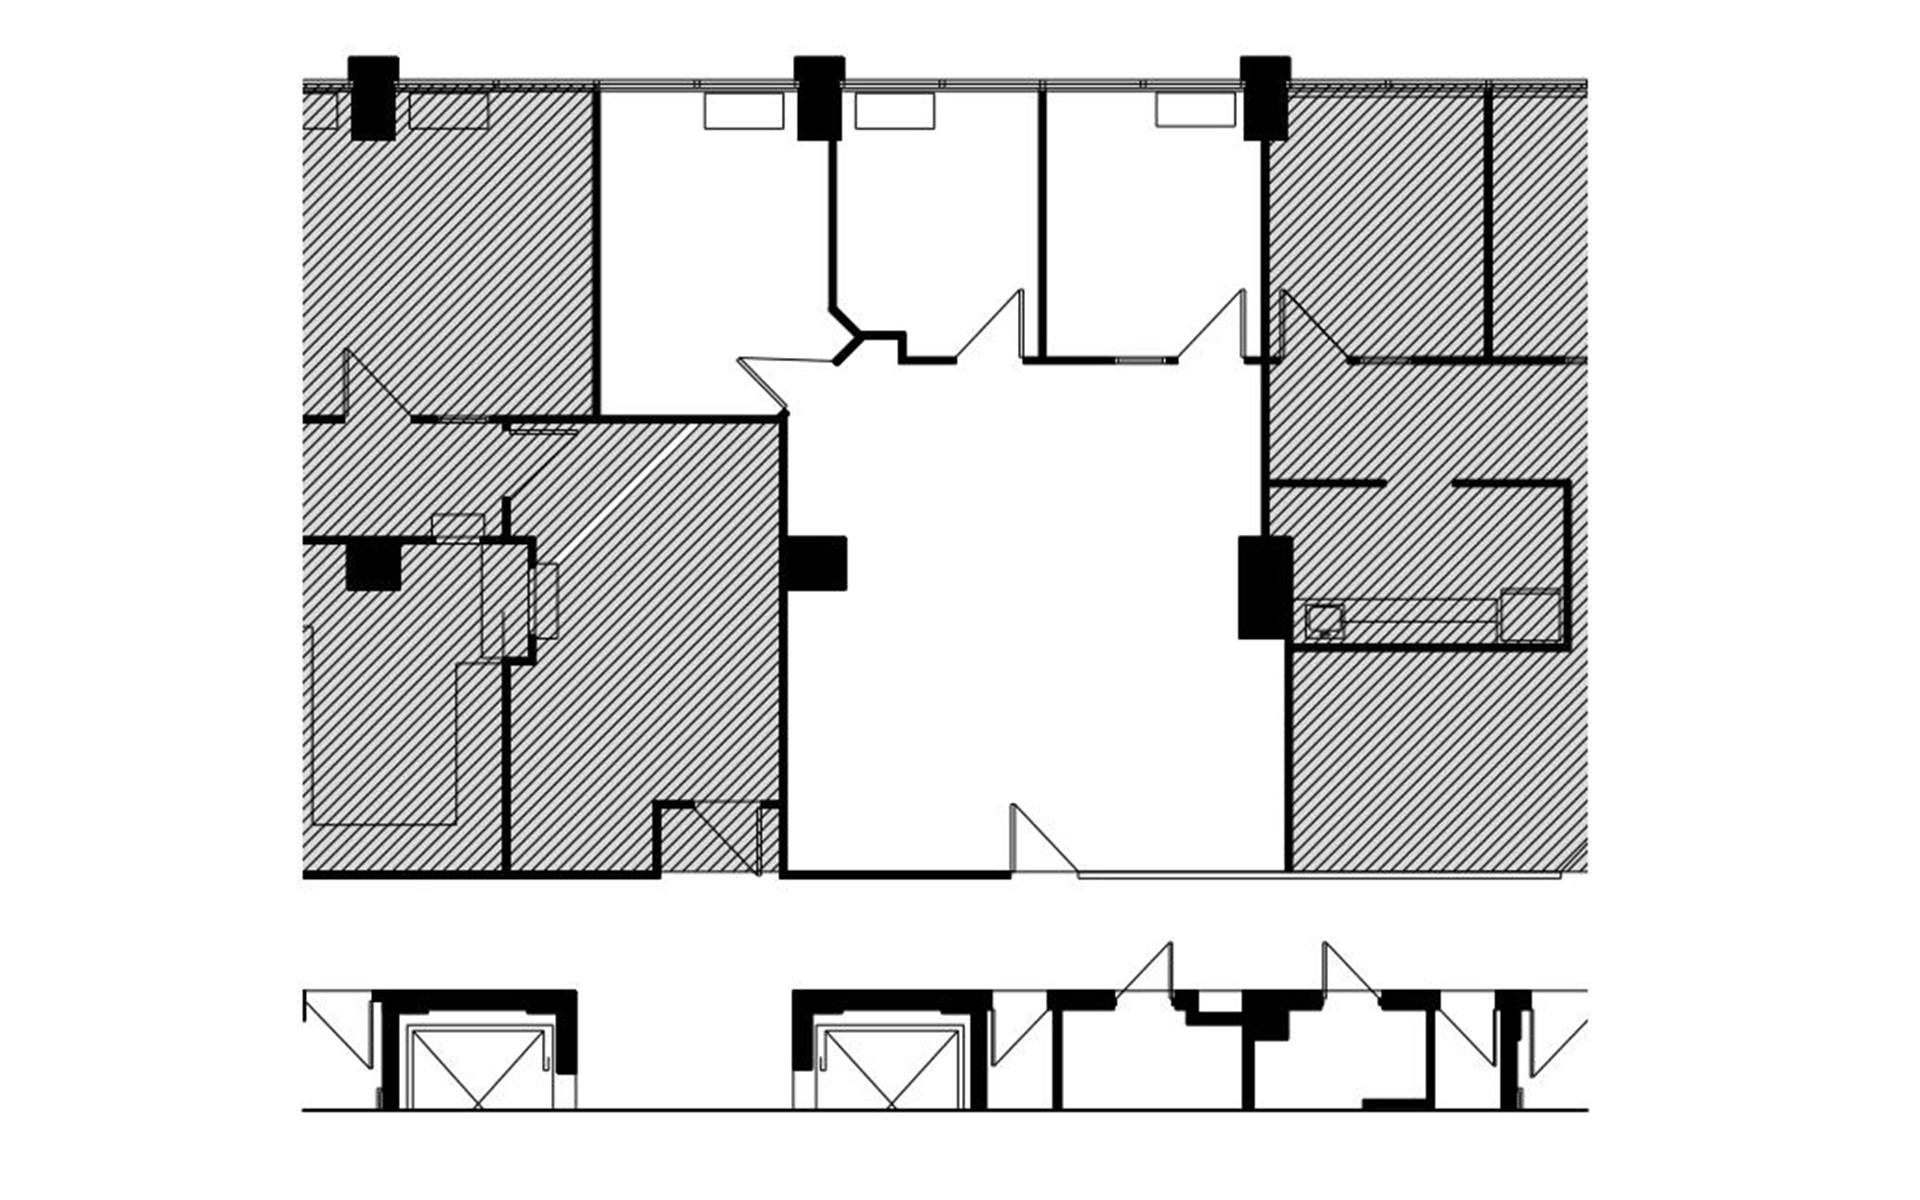 WashingtonREIT | 1600 Wilson Boulevard - Team Office | Suite 201